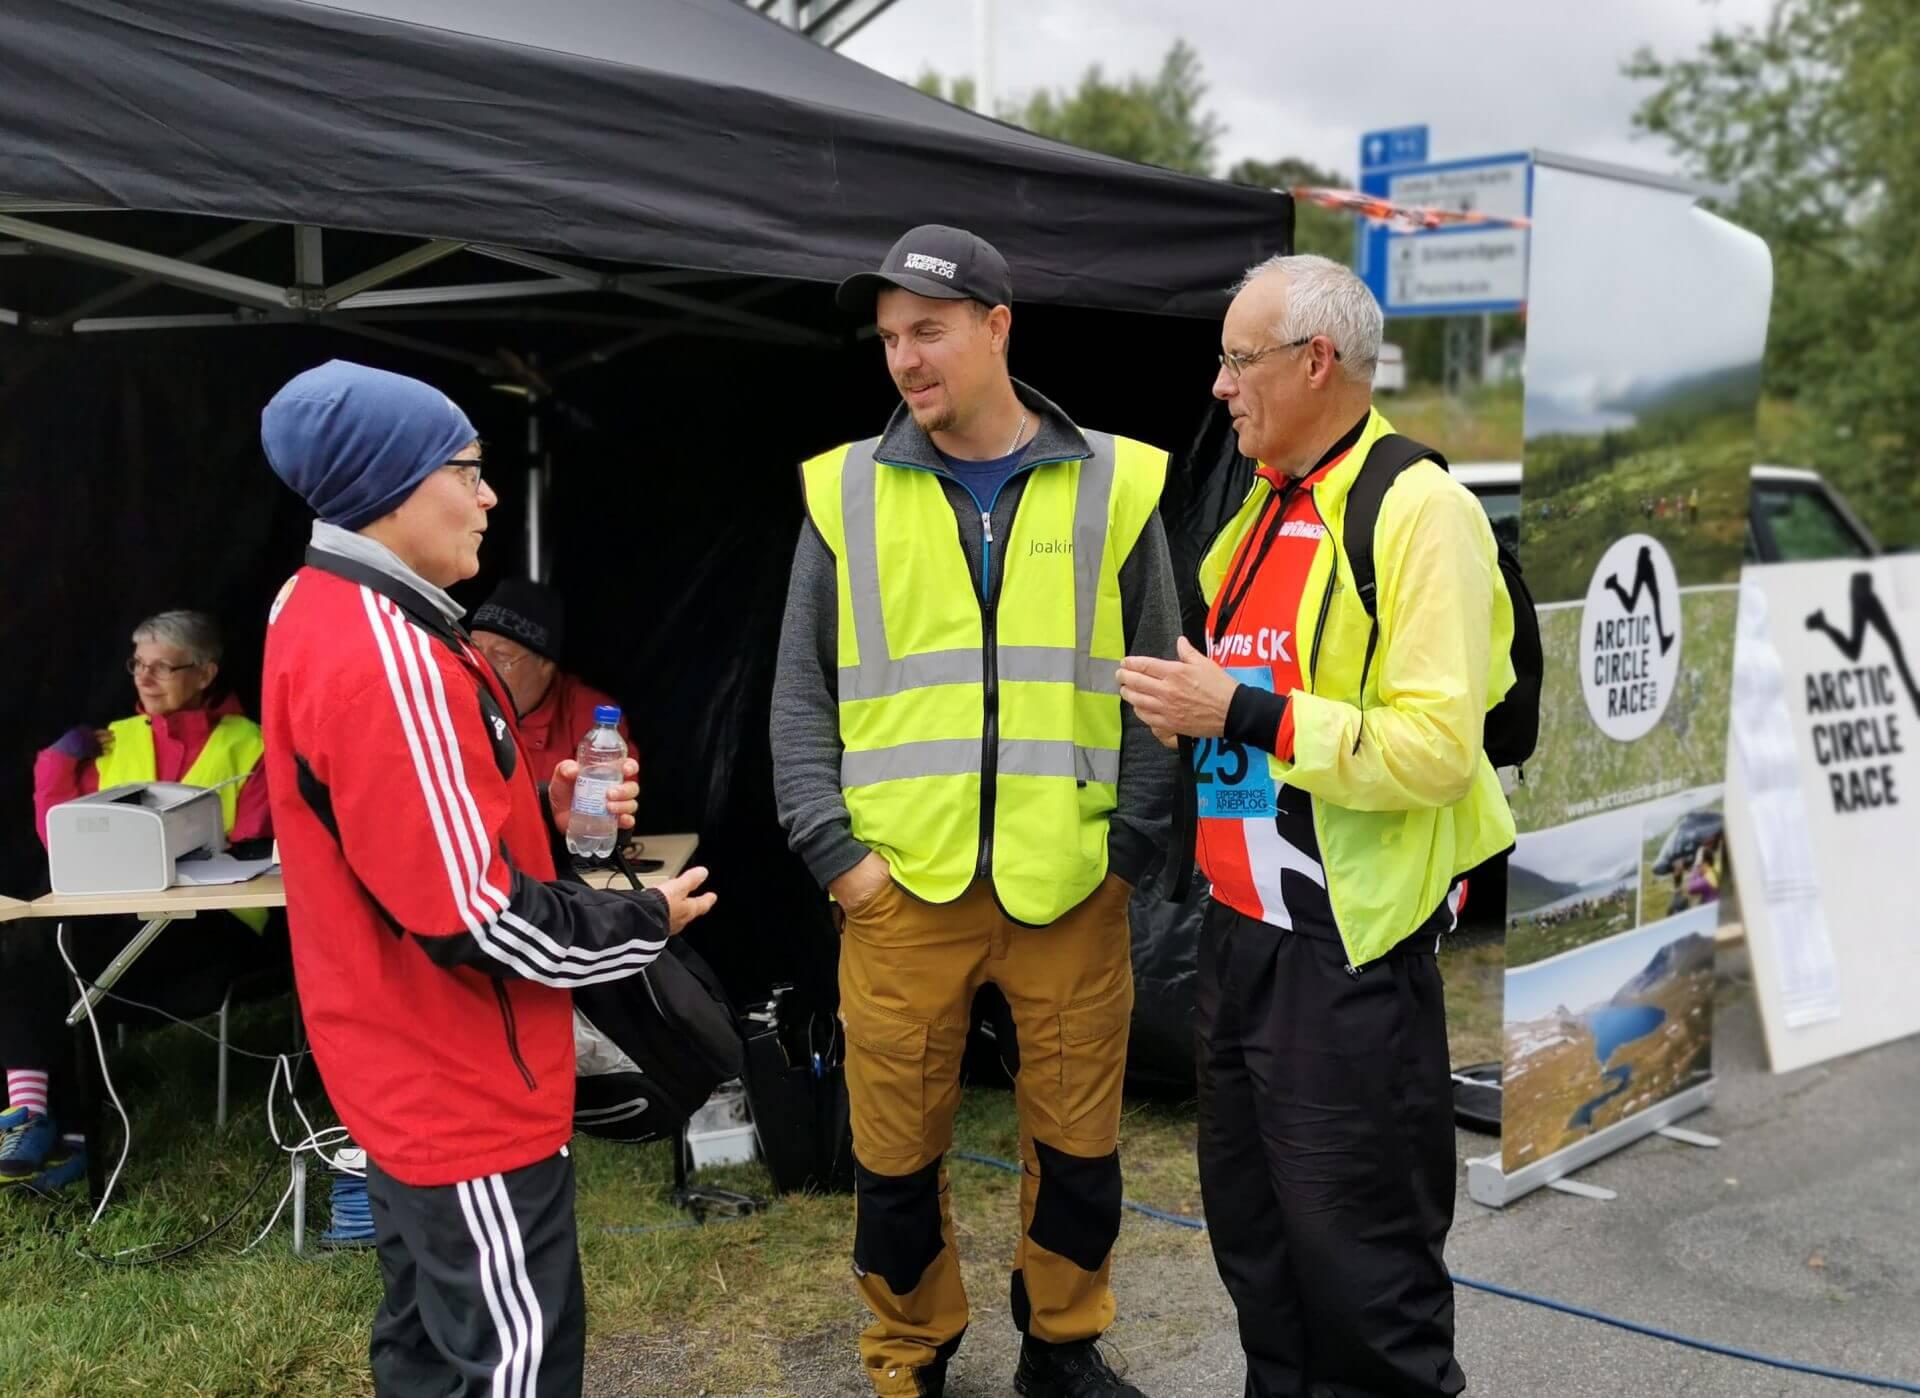 Arctic Circle Race 2019 Polcirkelloppet Guijaure mål jocke